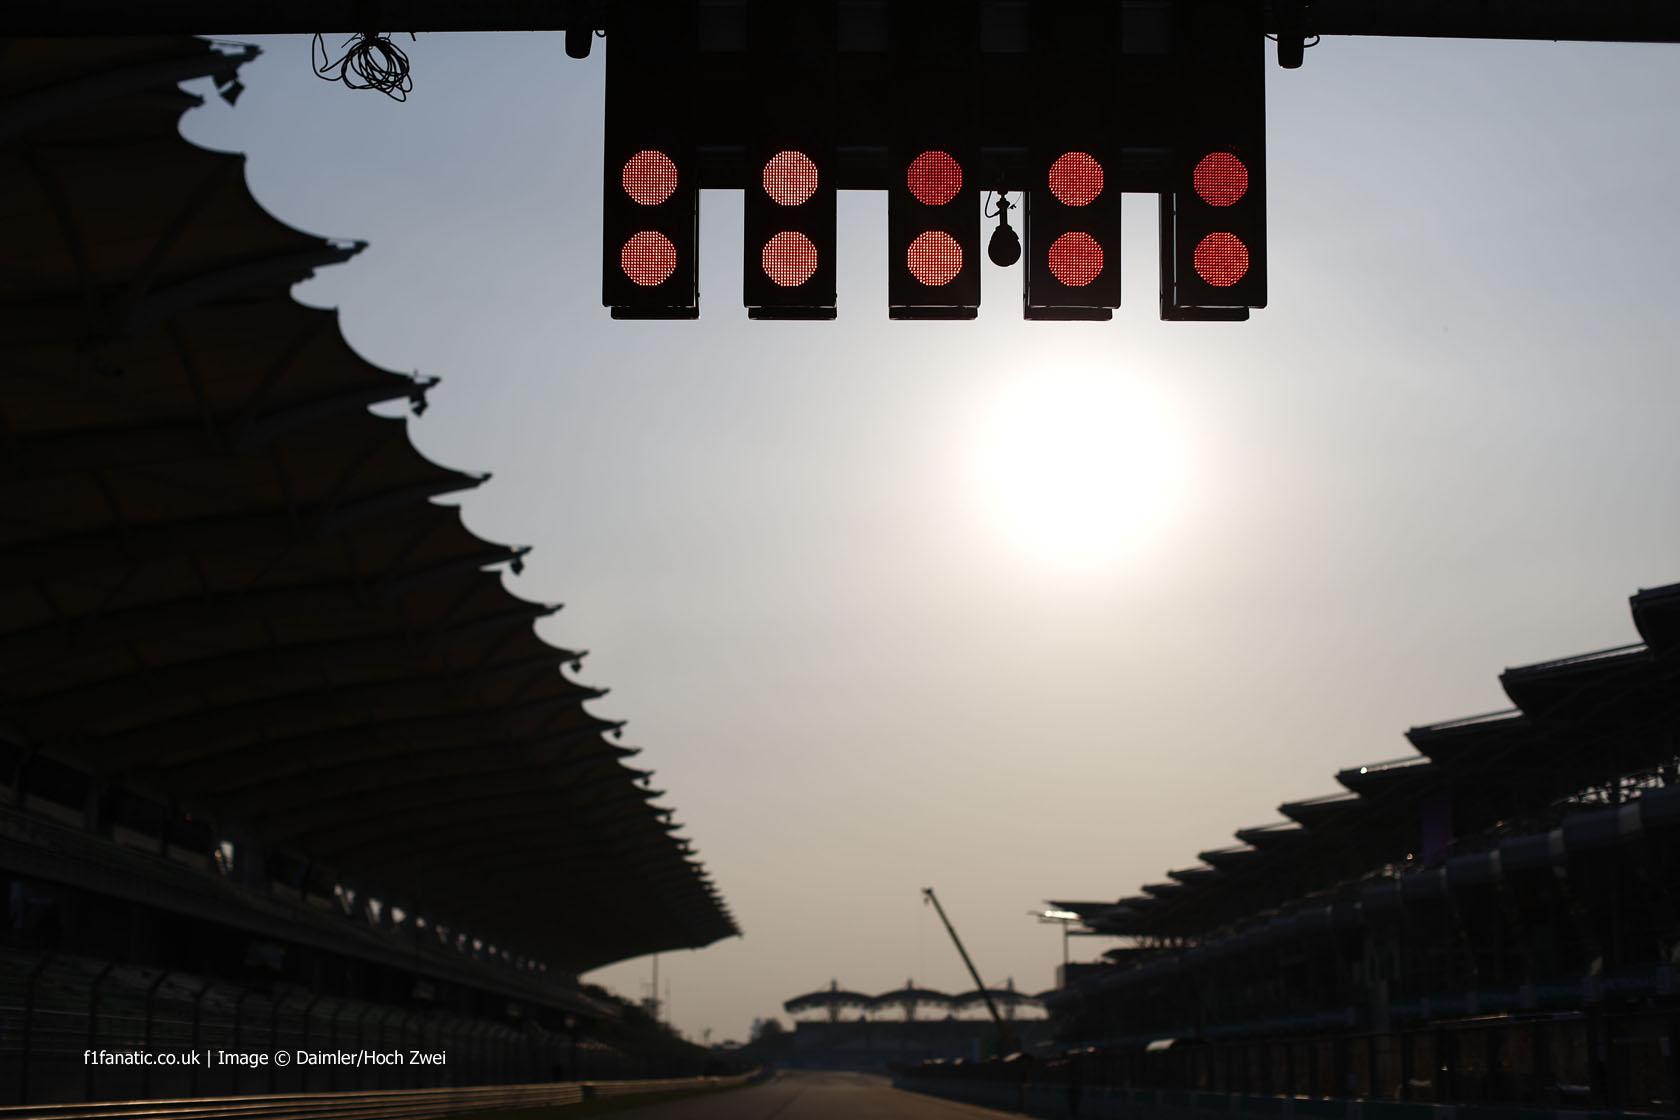 Lights, Sepang International Circuit, 2014